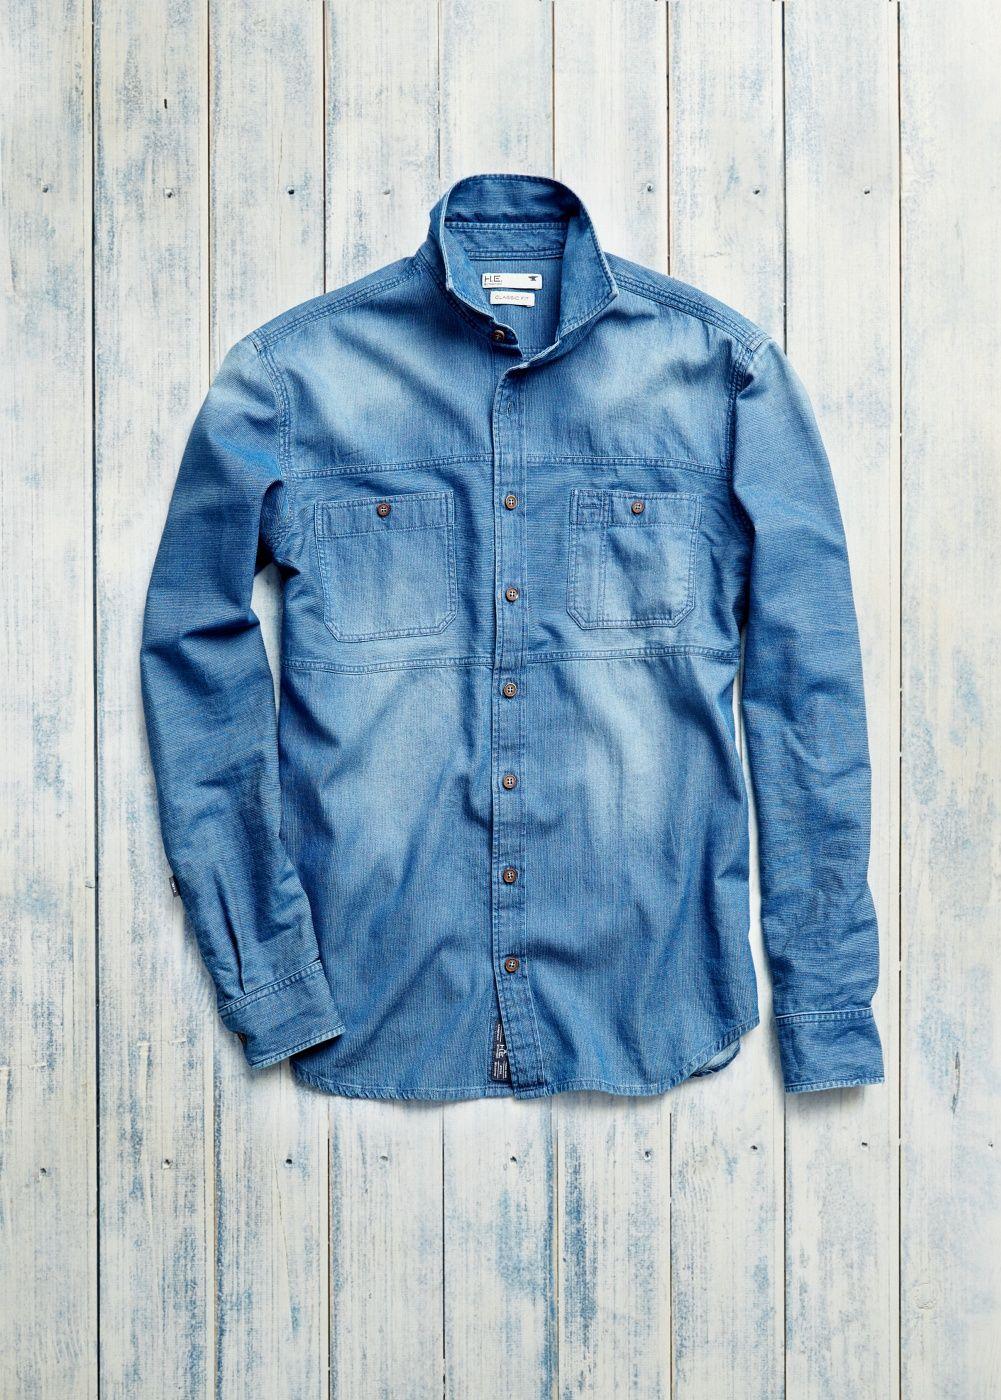 Stripe textured distressed shirt